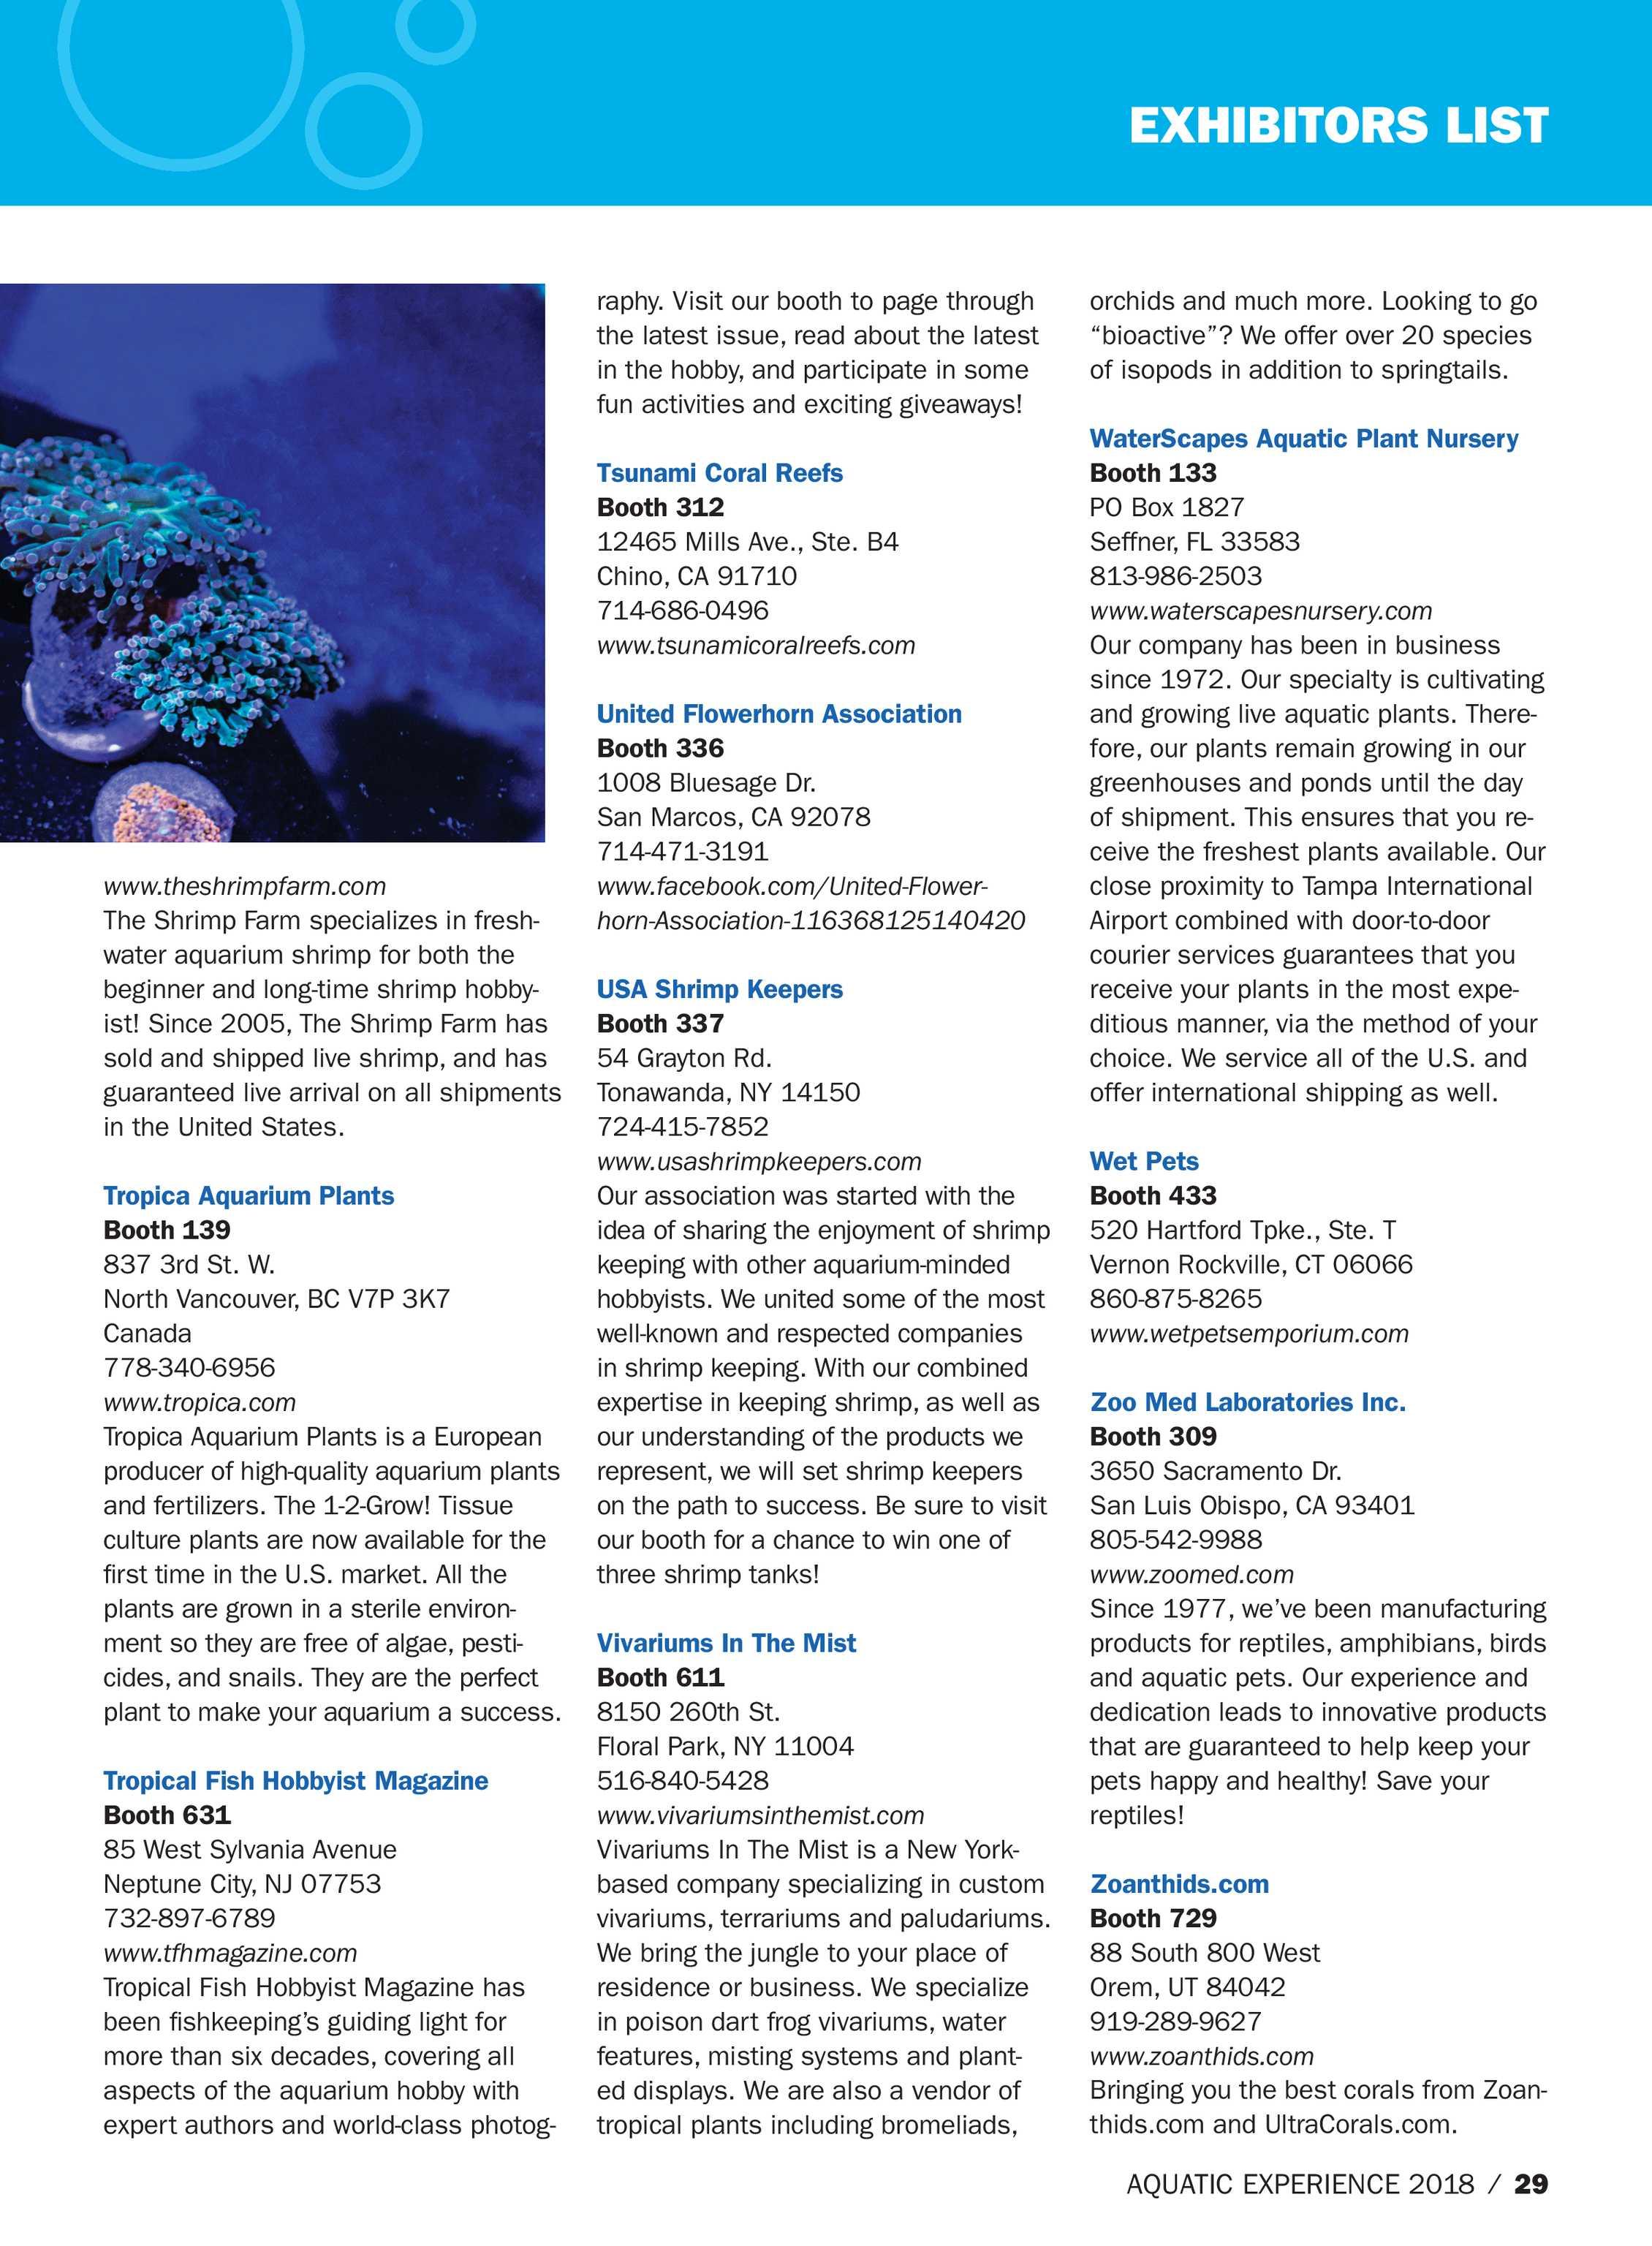 5fcdba57f9 Pet Product News - Aquatic Experience 2018 - page 29